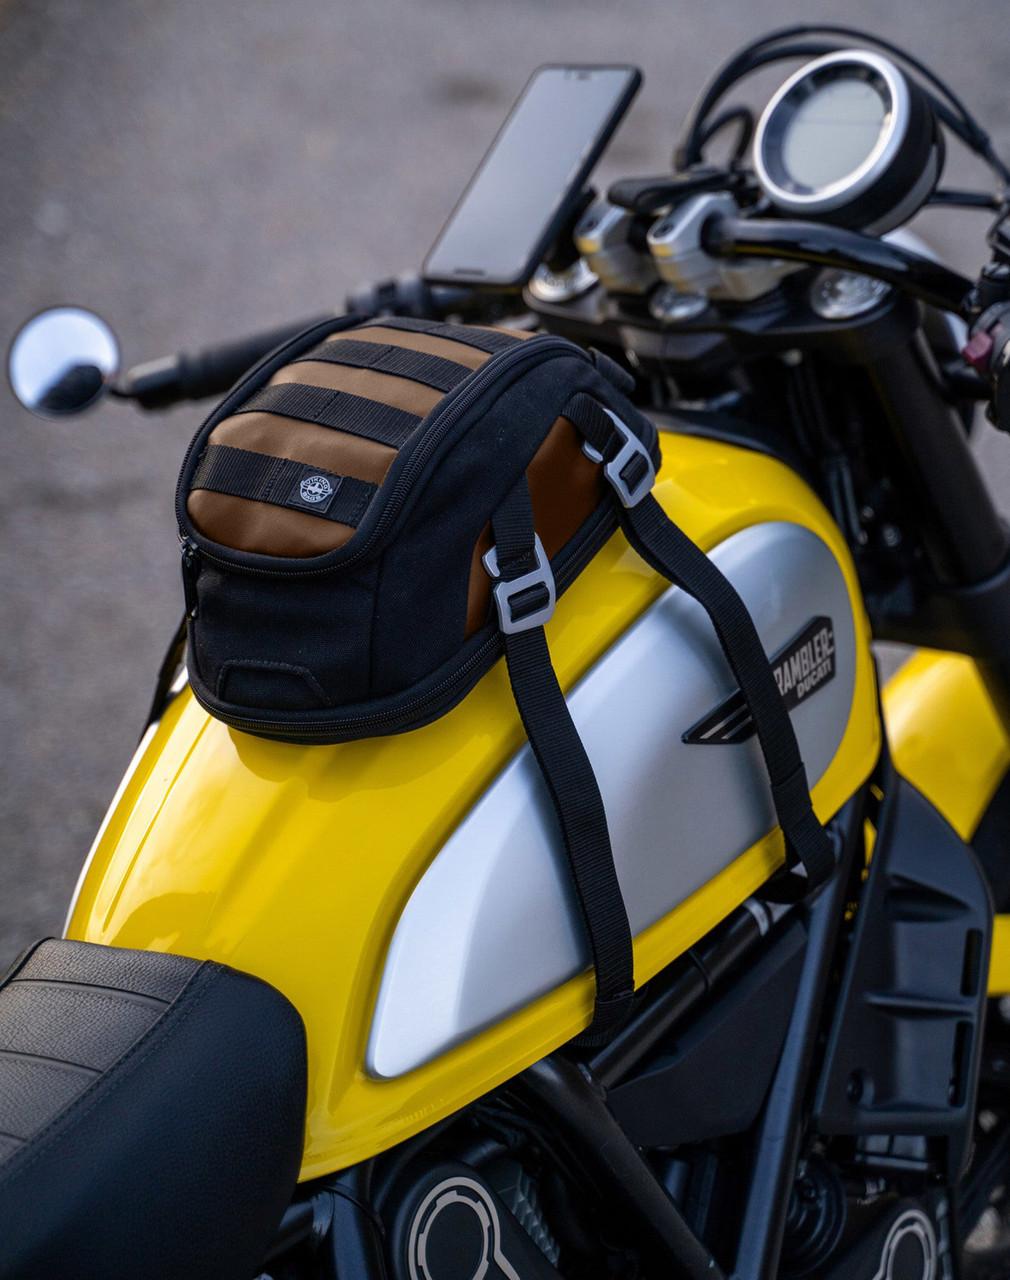 Viking Bonafide Brown Motorcycle Cafe Racer Tank Bag on Bike View